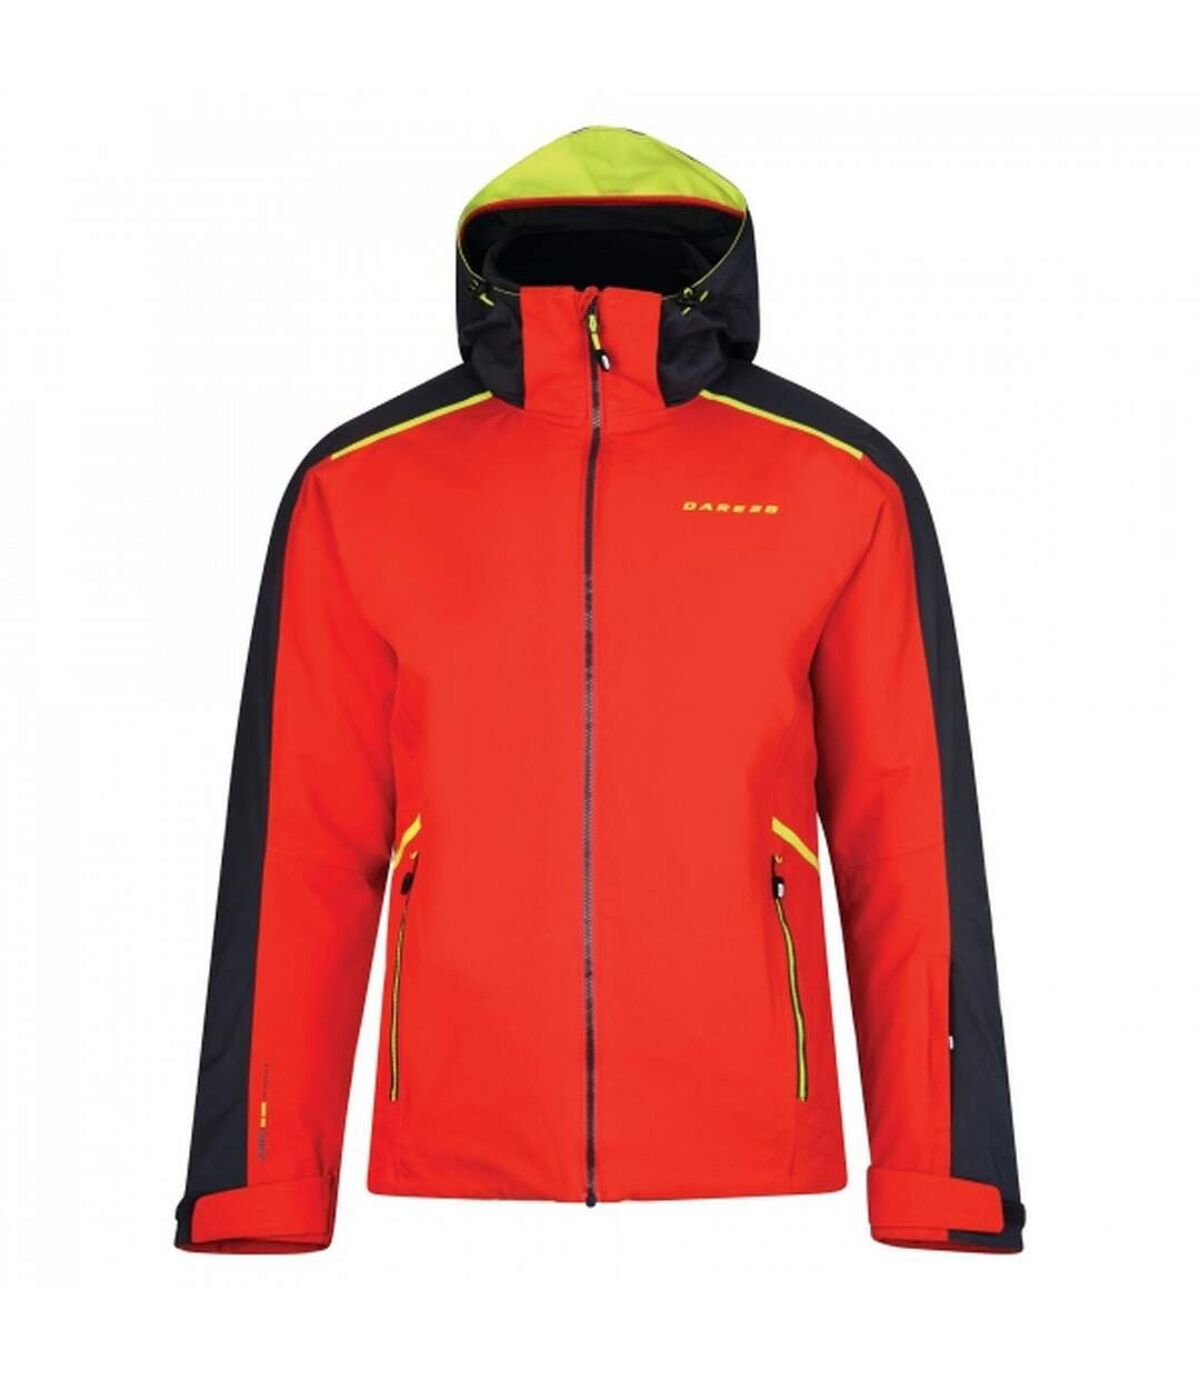 Dare2B Mens Educe Promo Jacket (Orient Red/Signal Black) - UTRG3597